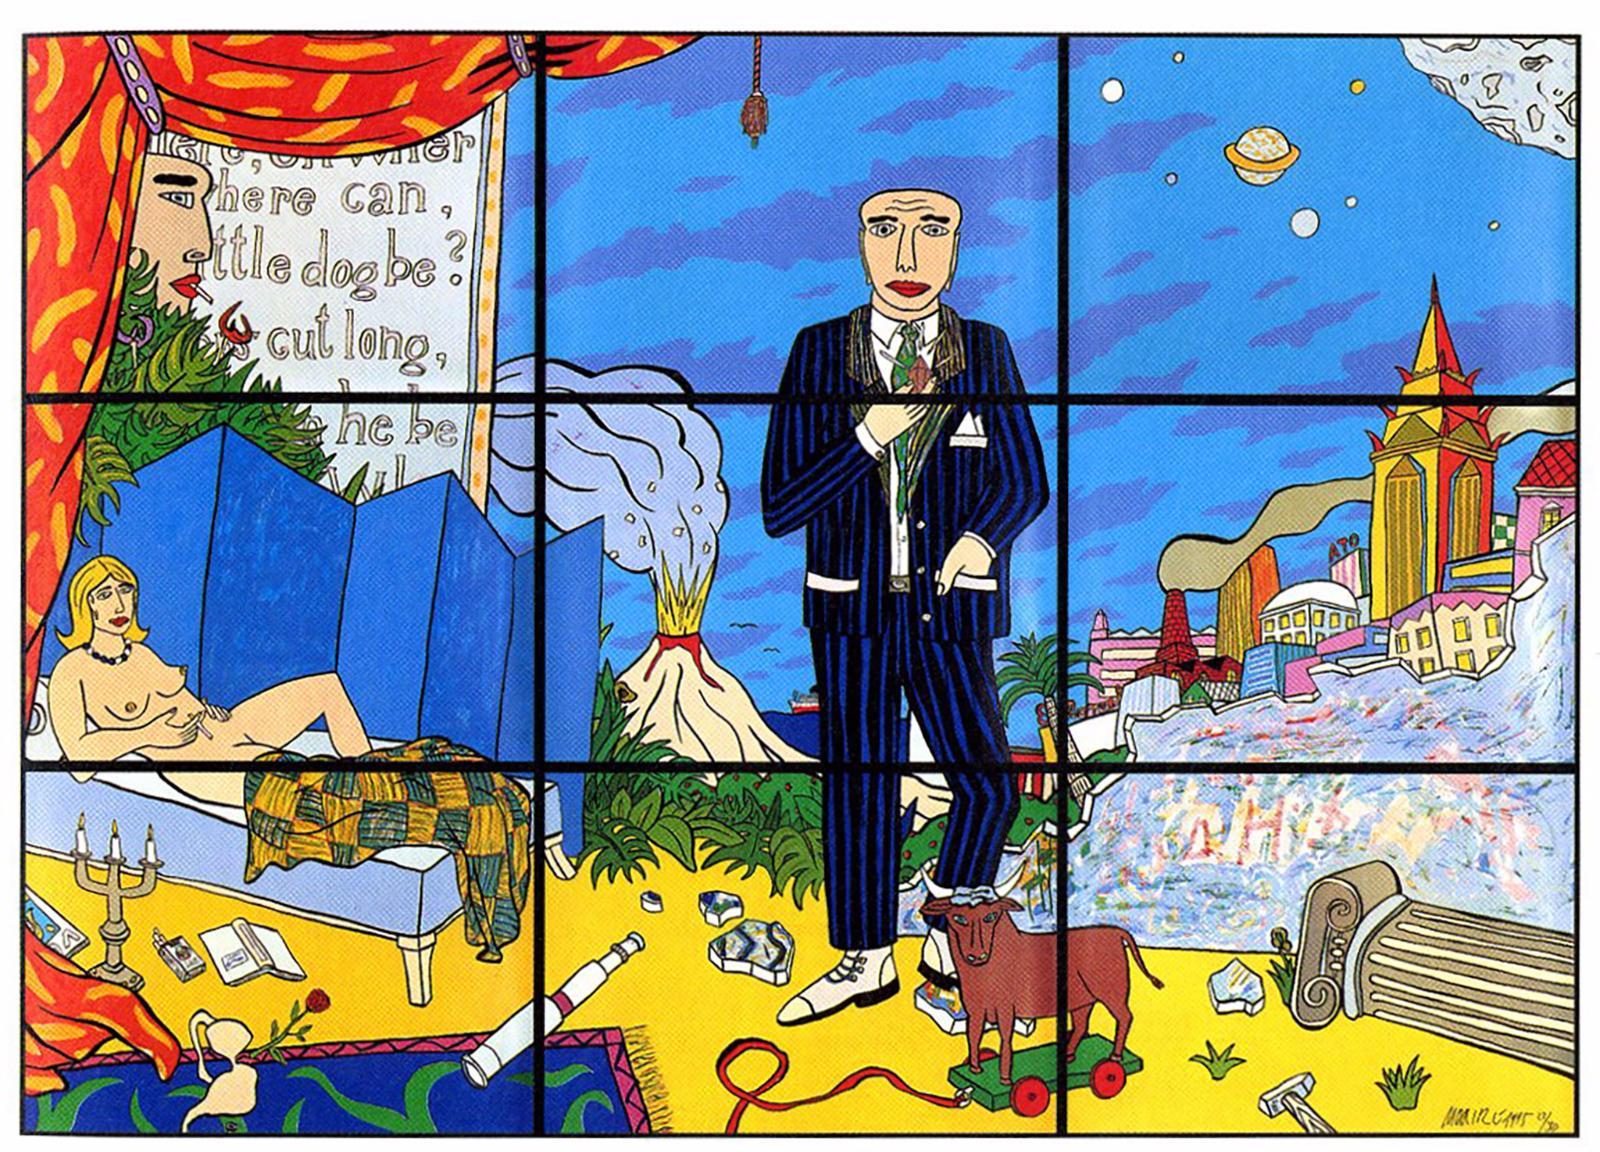 Moritz Götze,  Little Dog, 1995,  Farbgrafik 9-Teilig,  insgesamt 210 cm x 300 cm,  je 70 cm x 100 cm, gerahmt